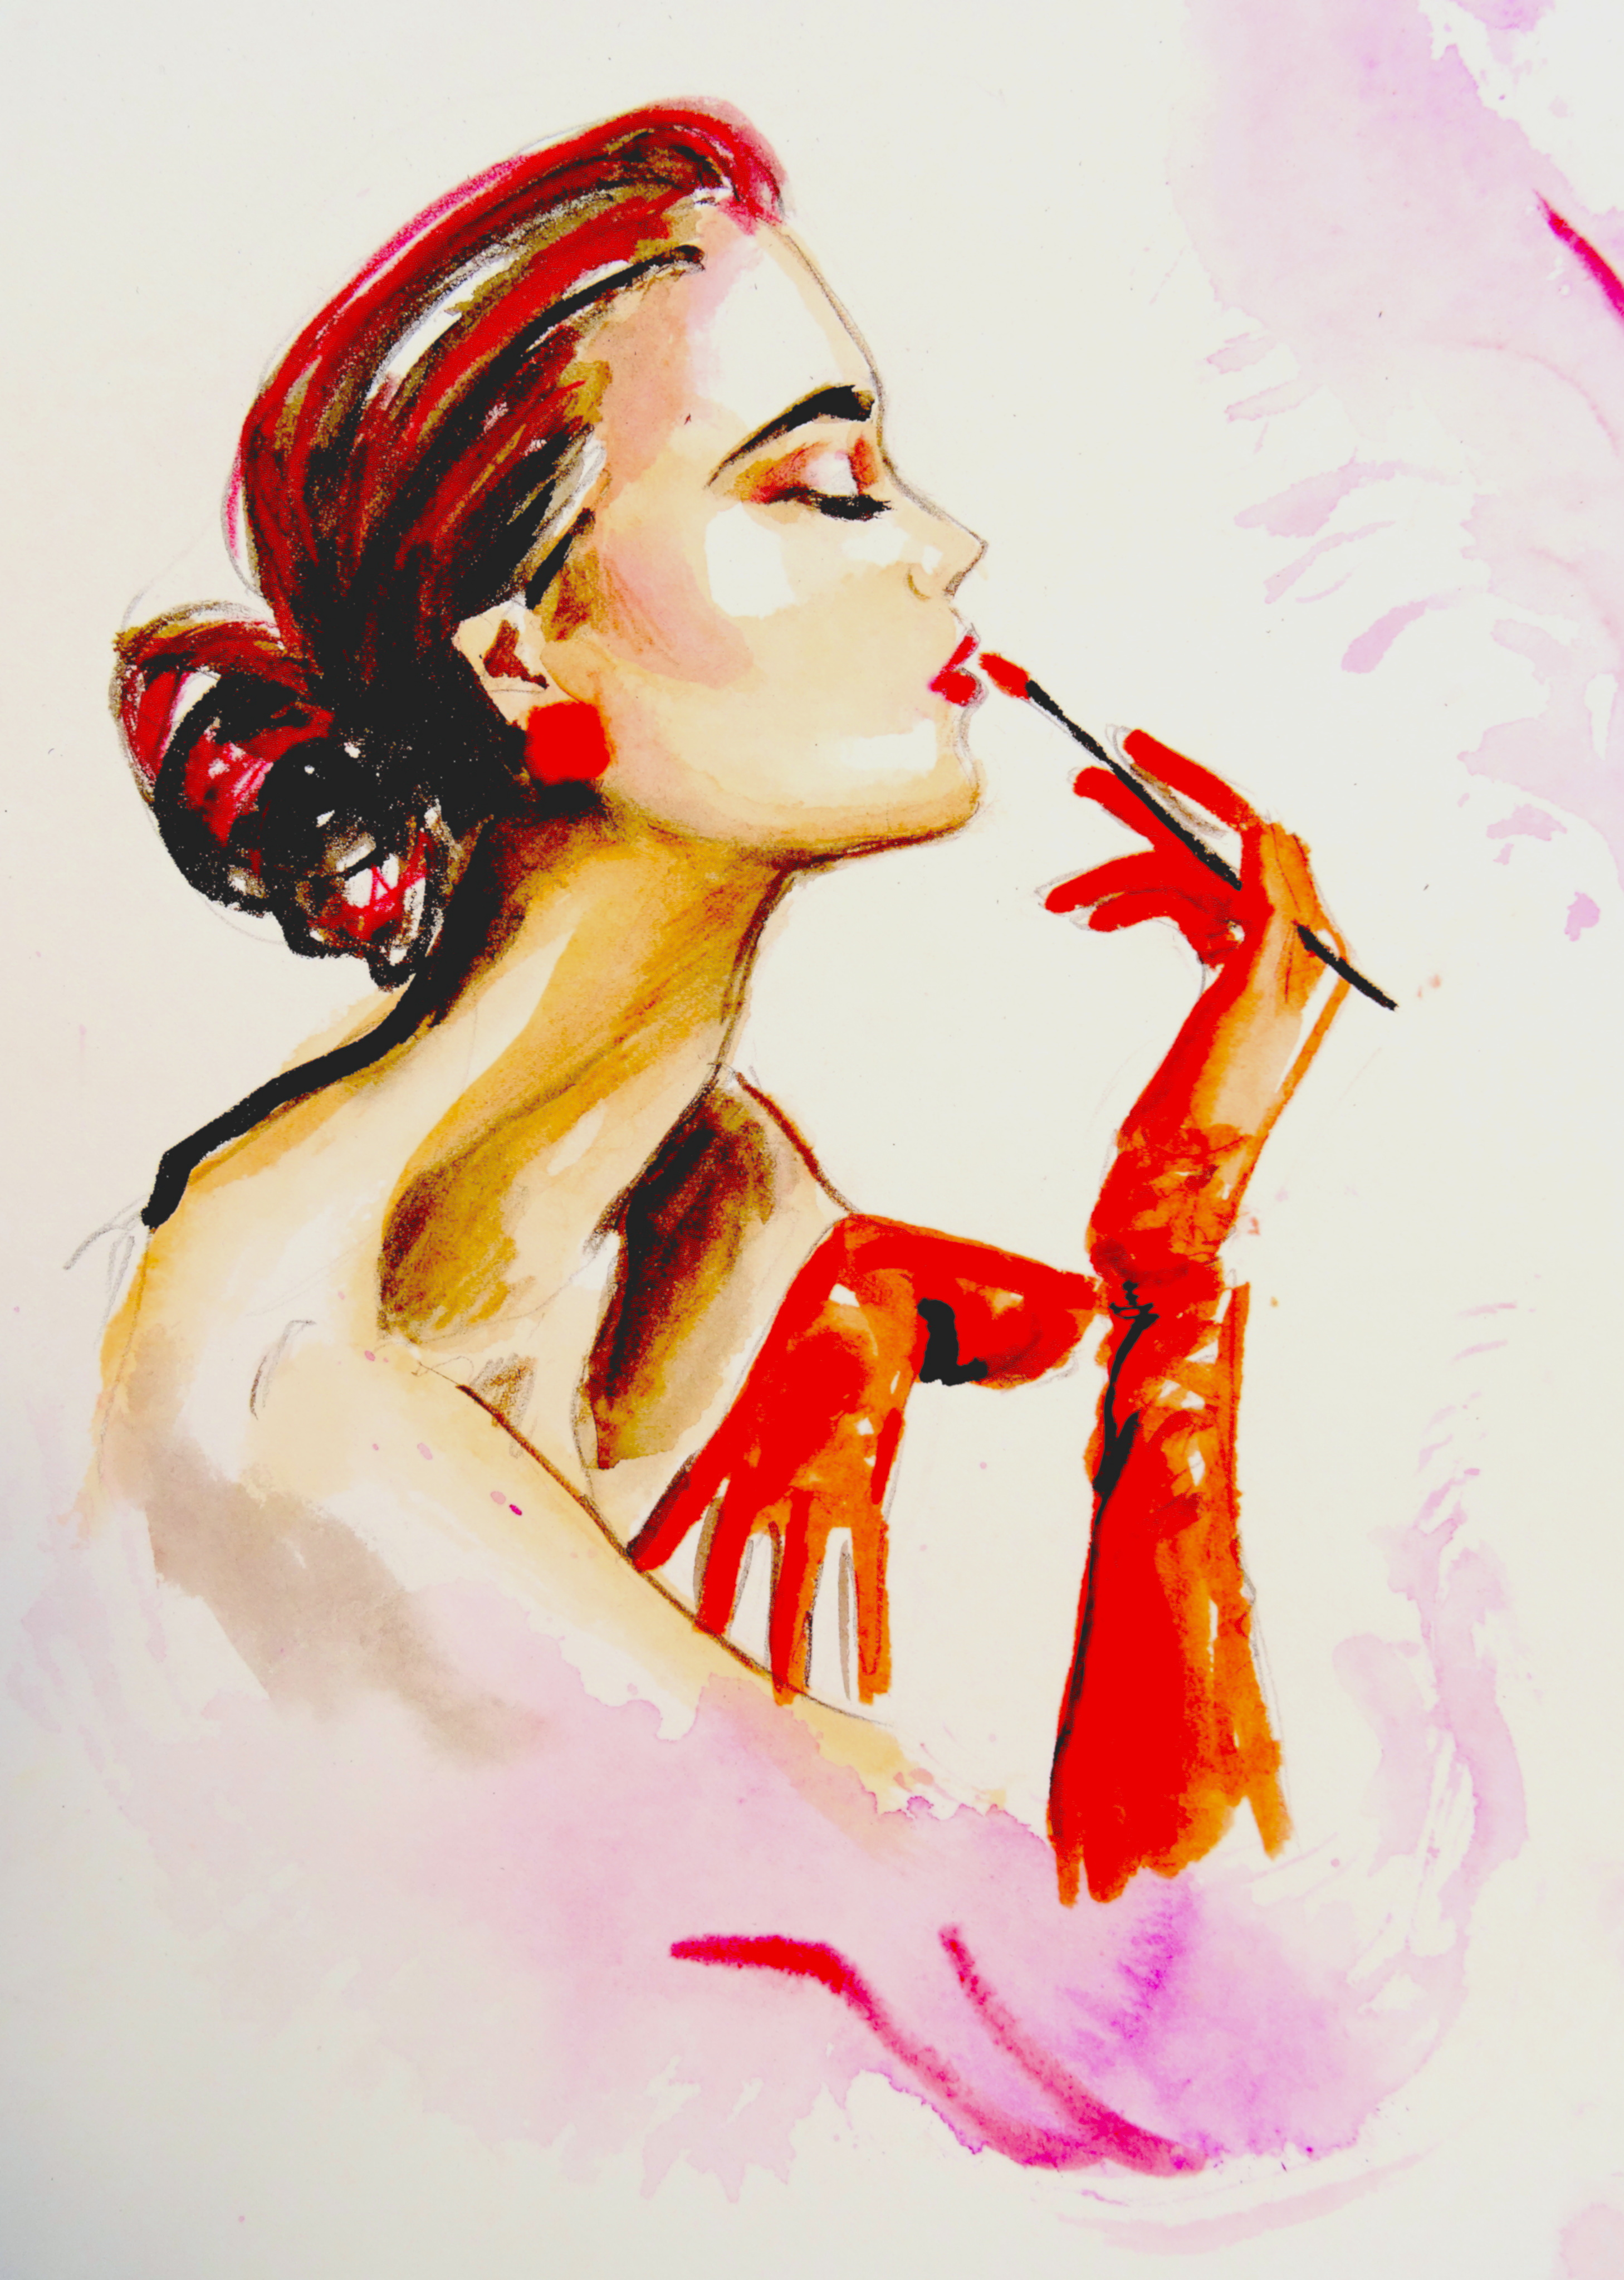 Lipstick markets